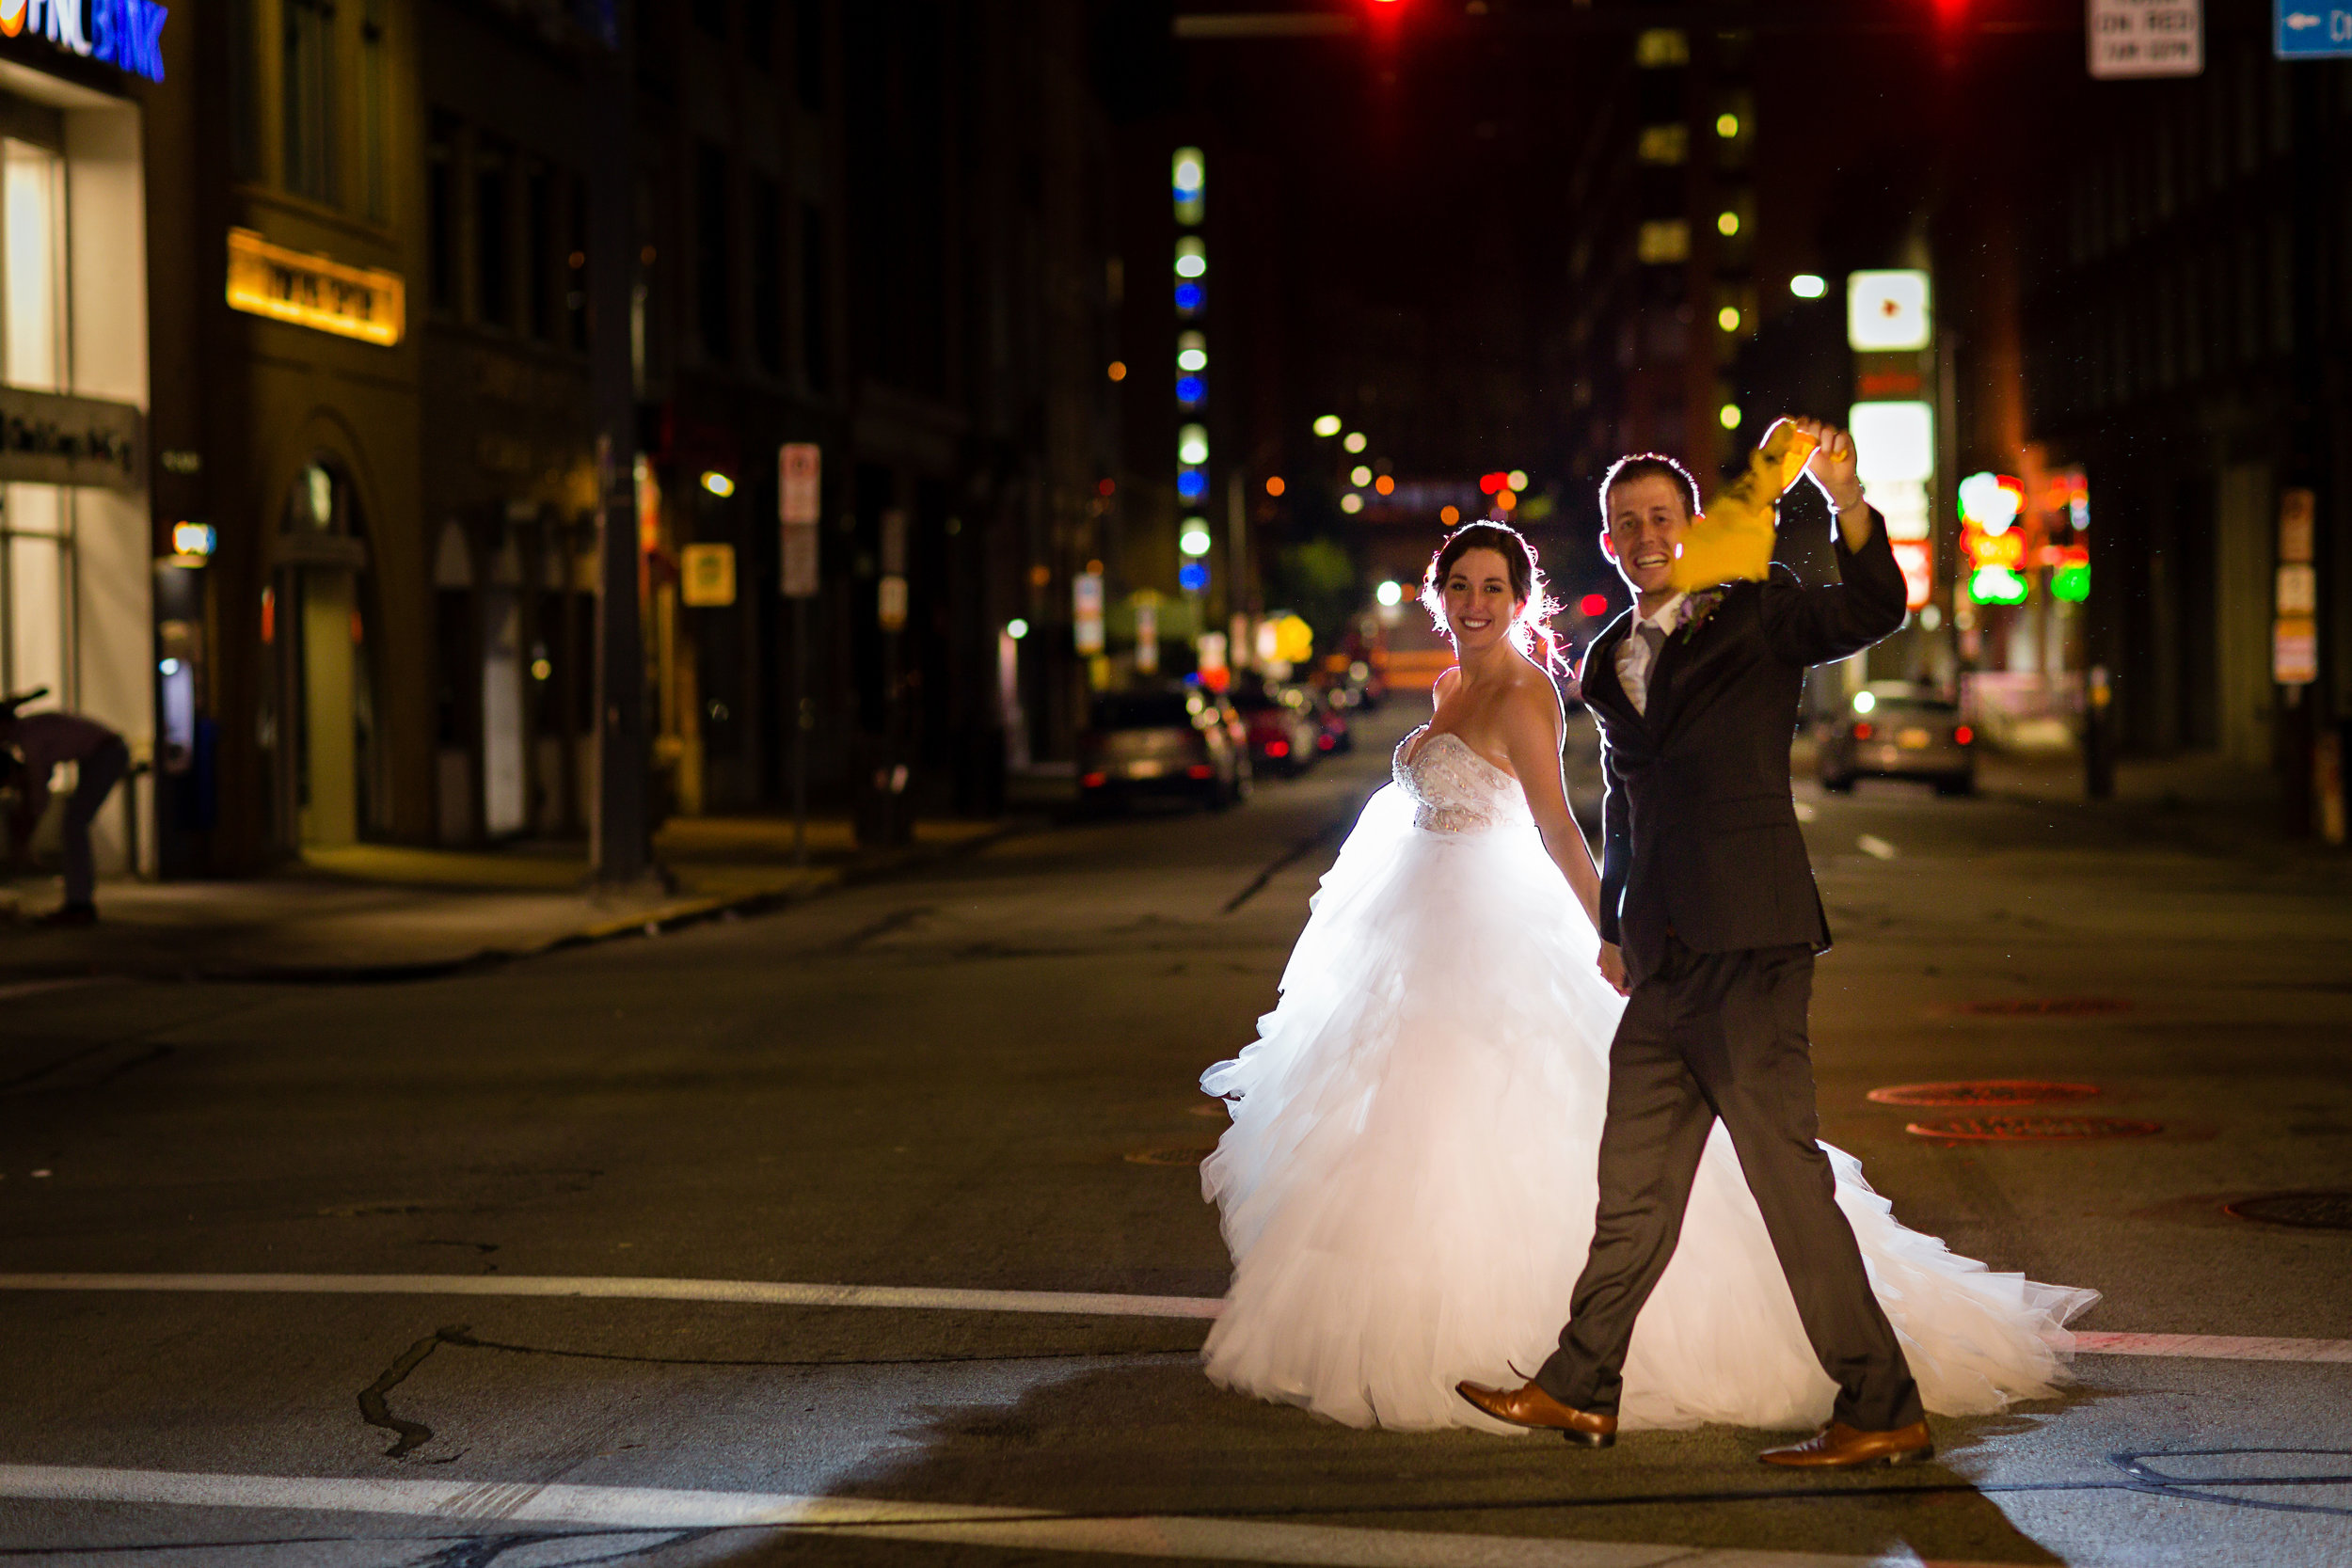 Gorgeous Wedding Photos - Pittsburgh Wedding Venue - Duquesne University Wedding